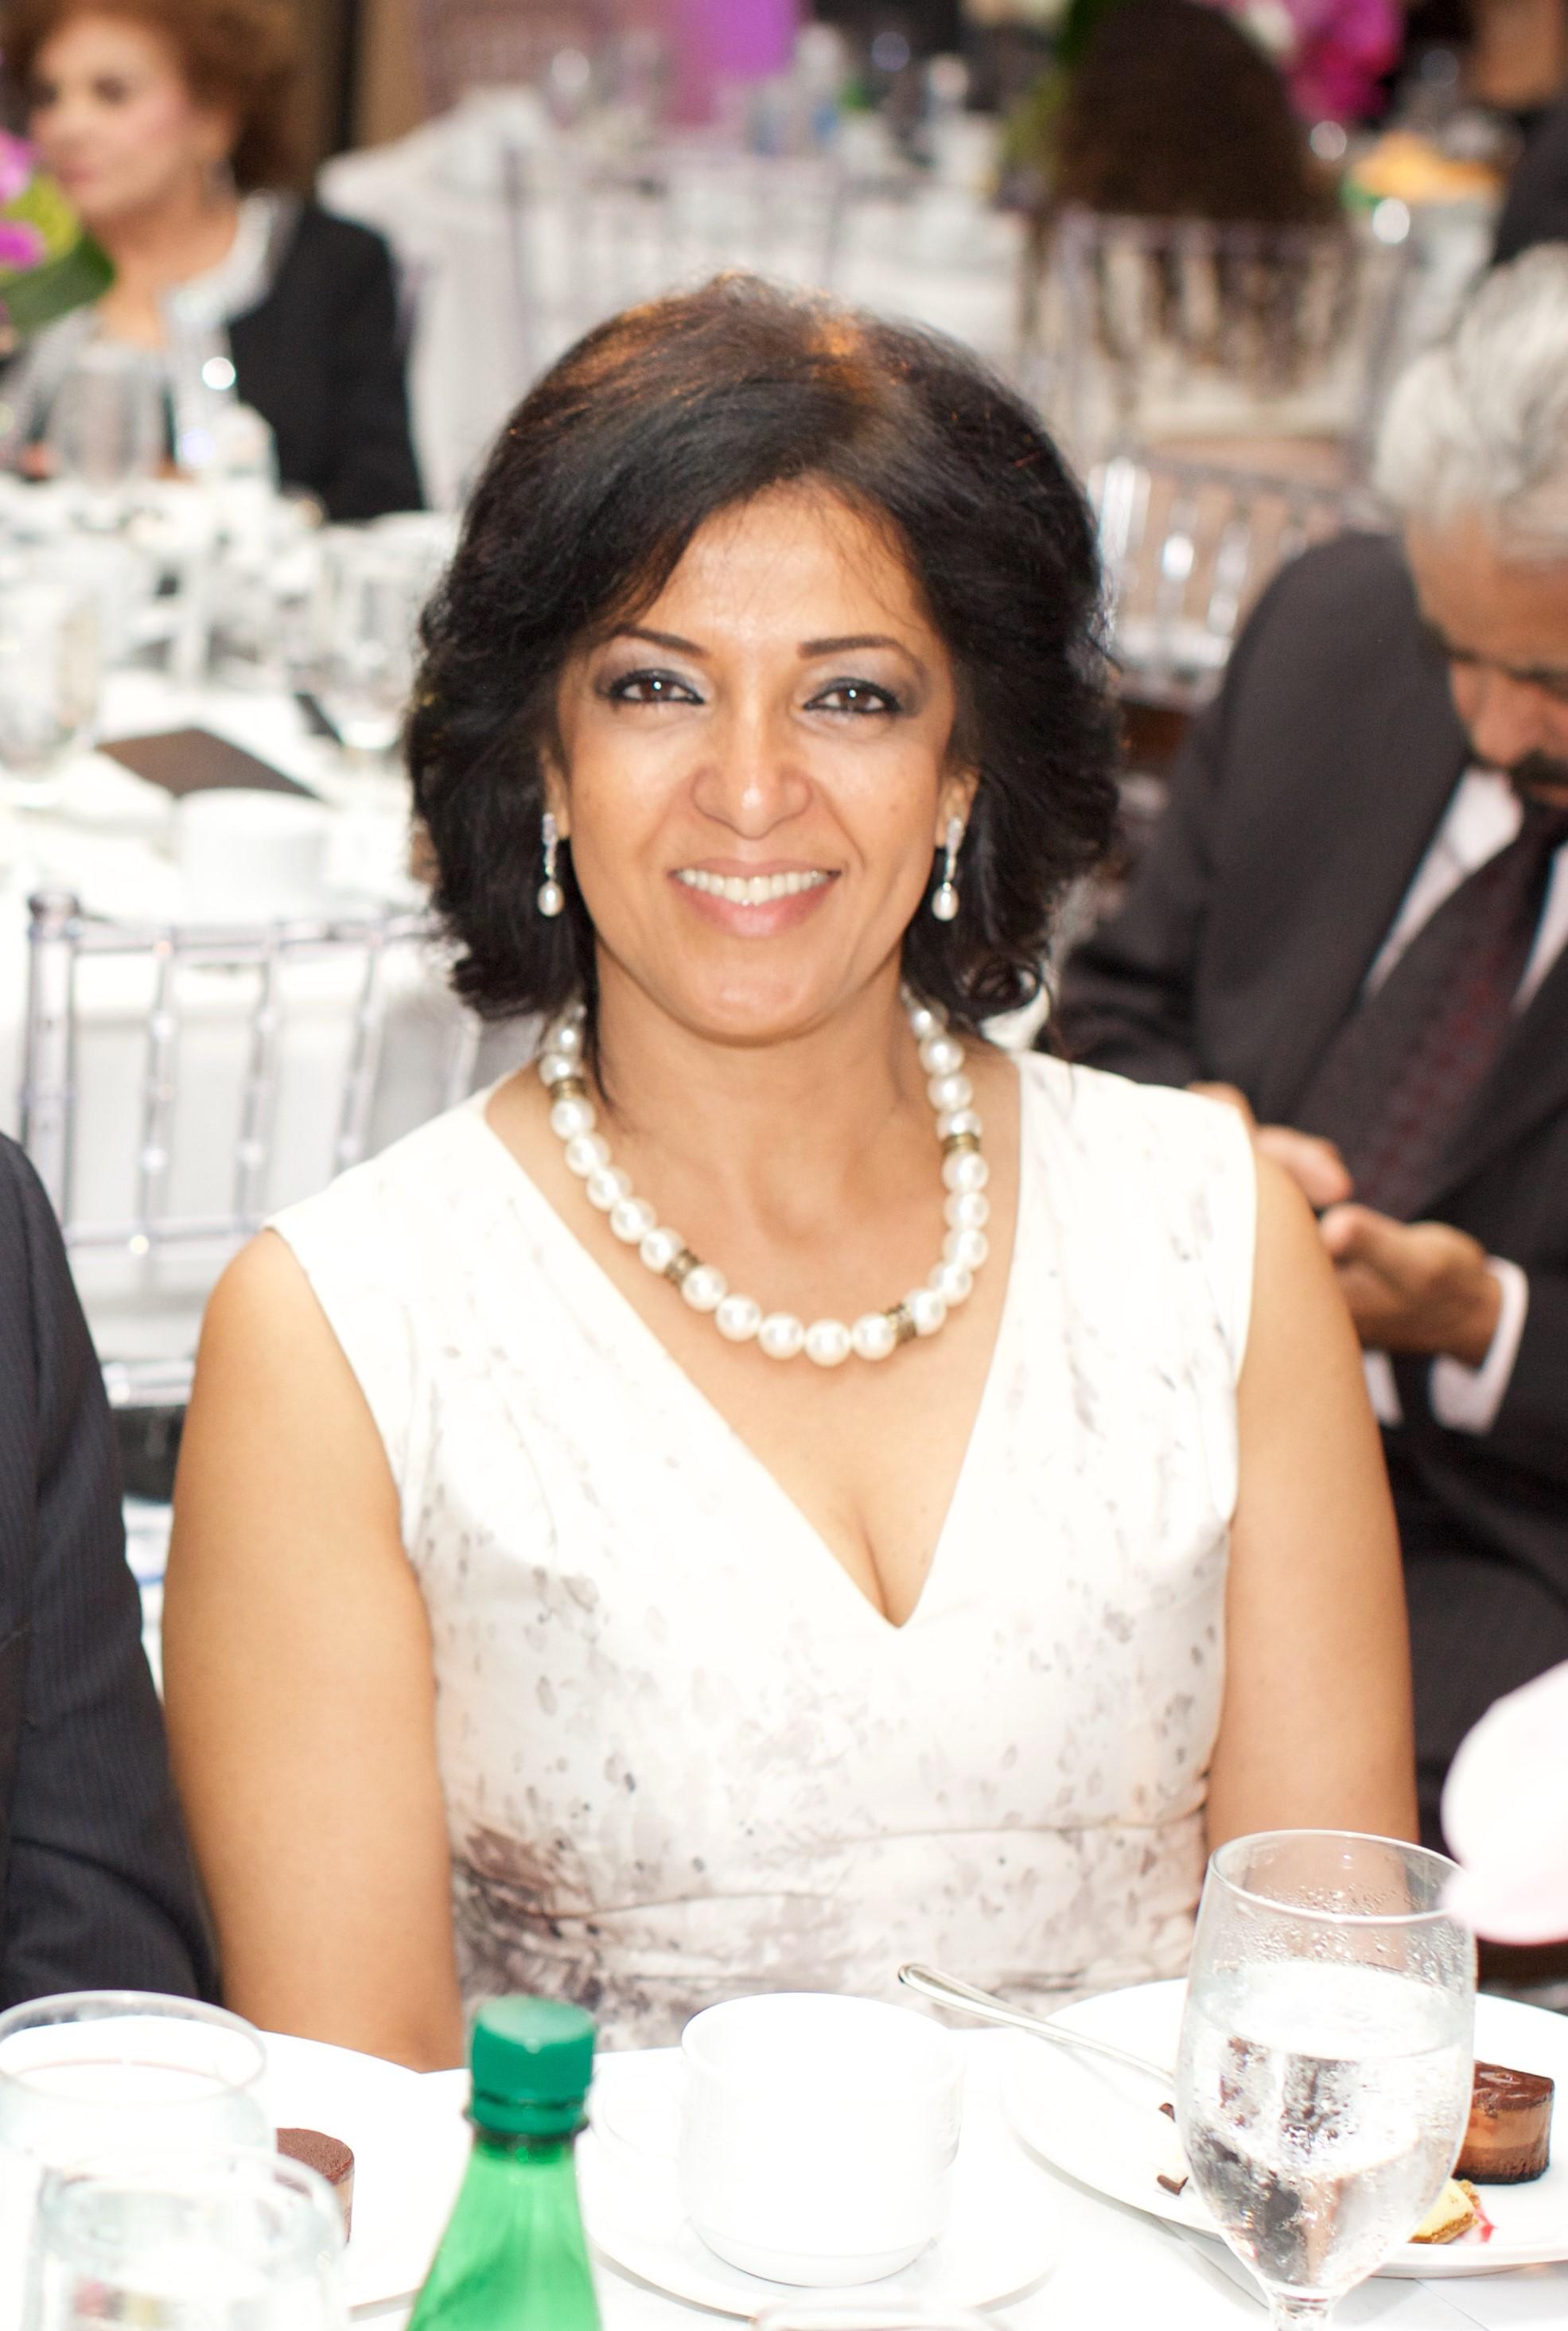 H.E. Ambassador Lamia Mekhemar,Consul General of Egypt in Los Angeles